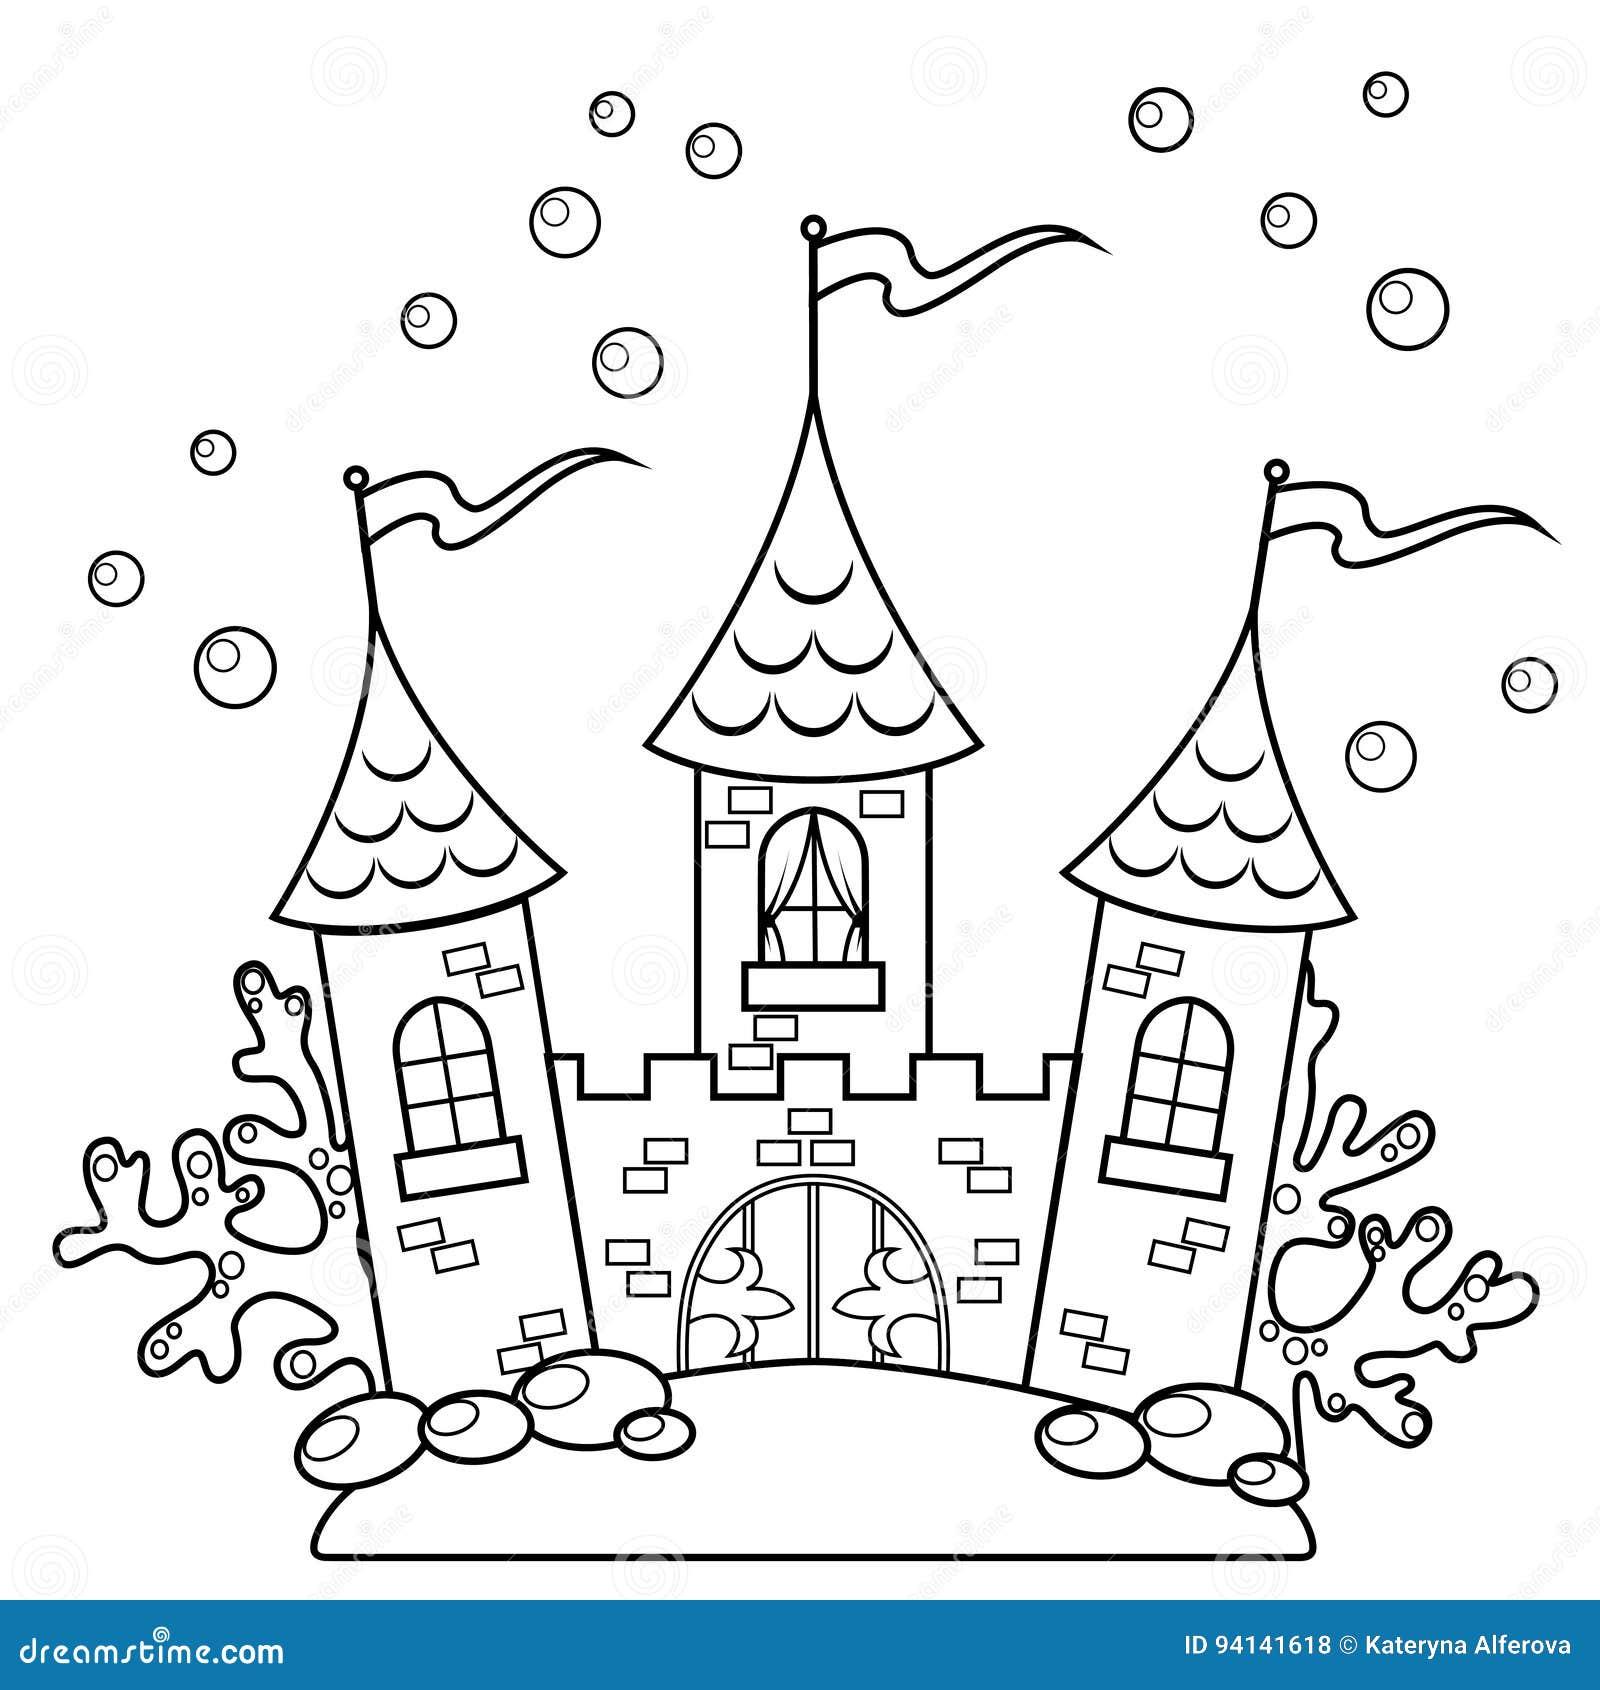 Underwater Castle Black And White Vector Illustration For